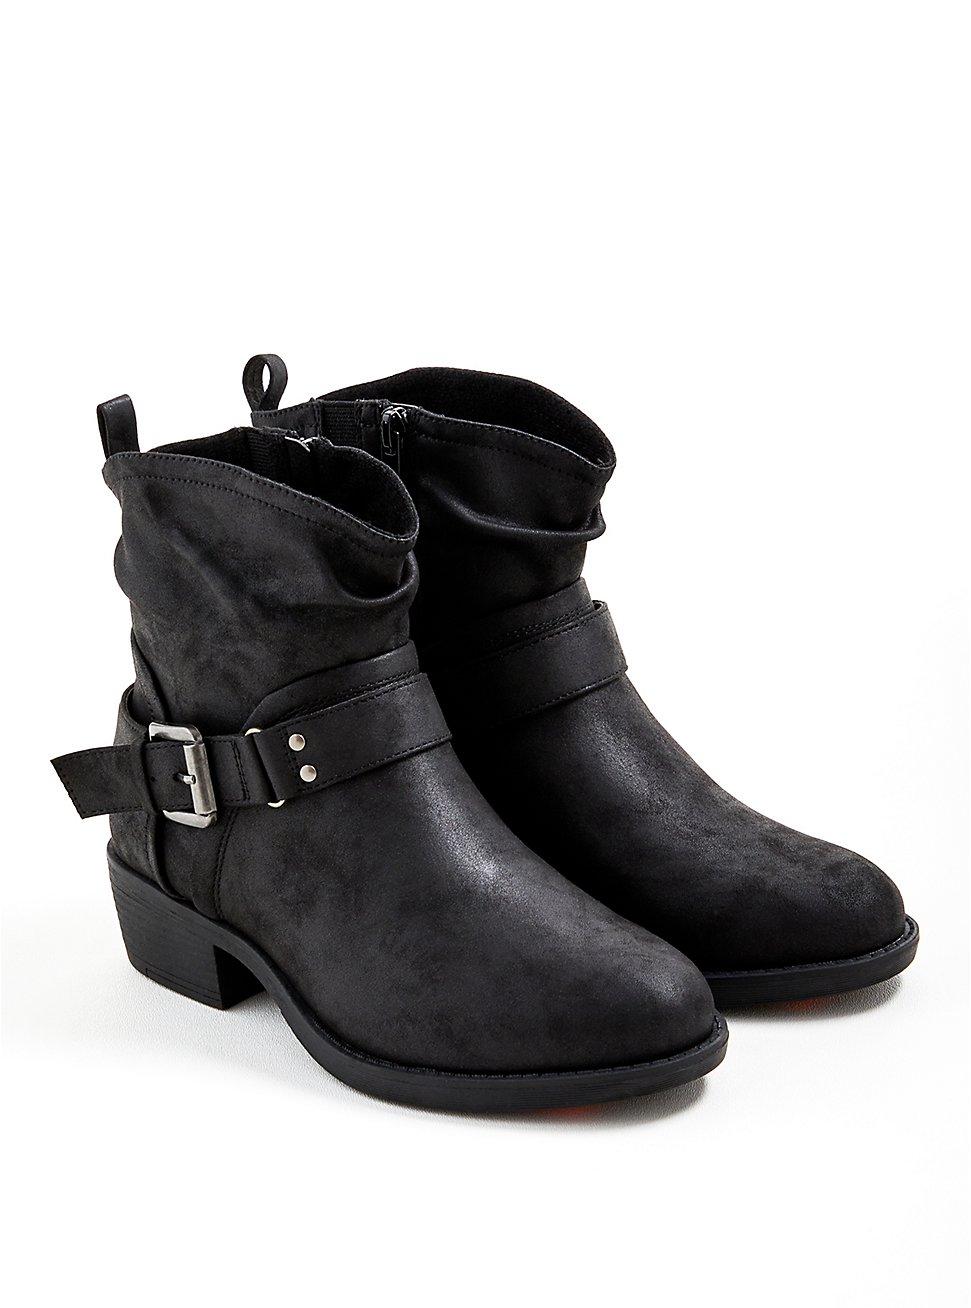 Plus Size Slouchy Moto Boot - Faux Leather Black, BLACK, hi-res